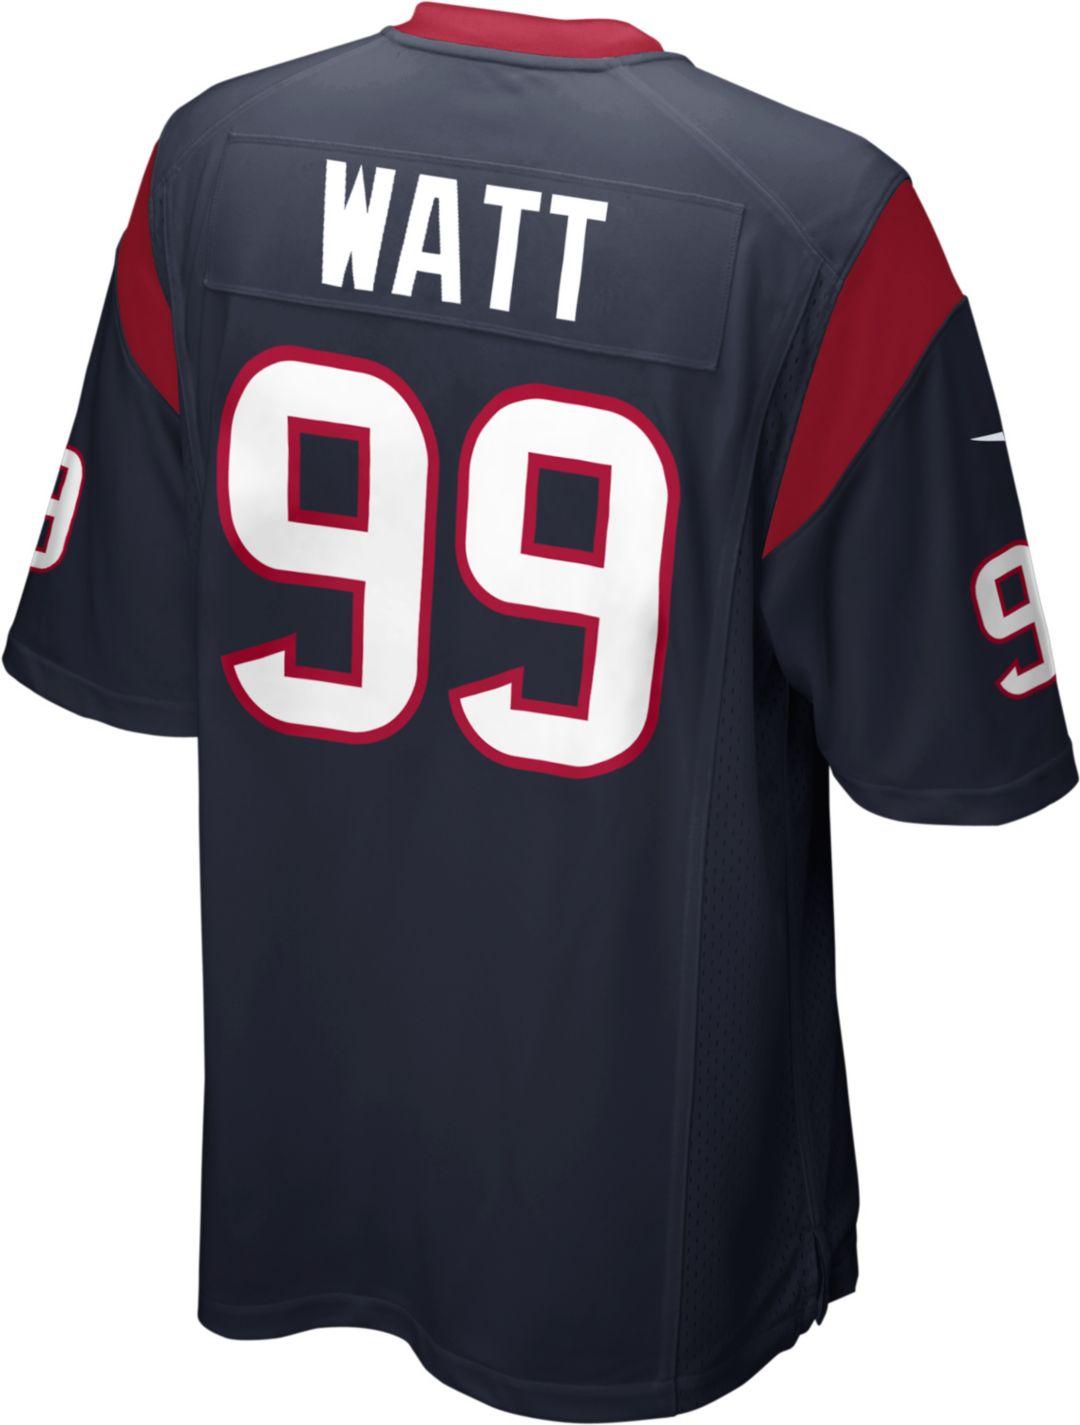 reputable site a046f 899d1 Nike Men's Home Game Jersey Houston Texans J.J. Watt #99